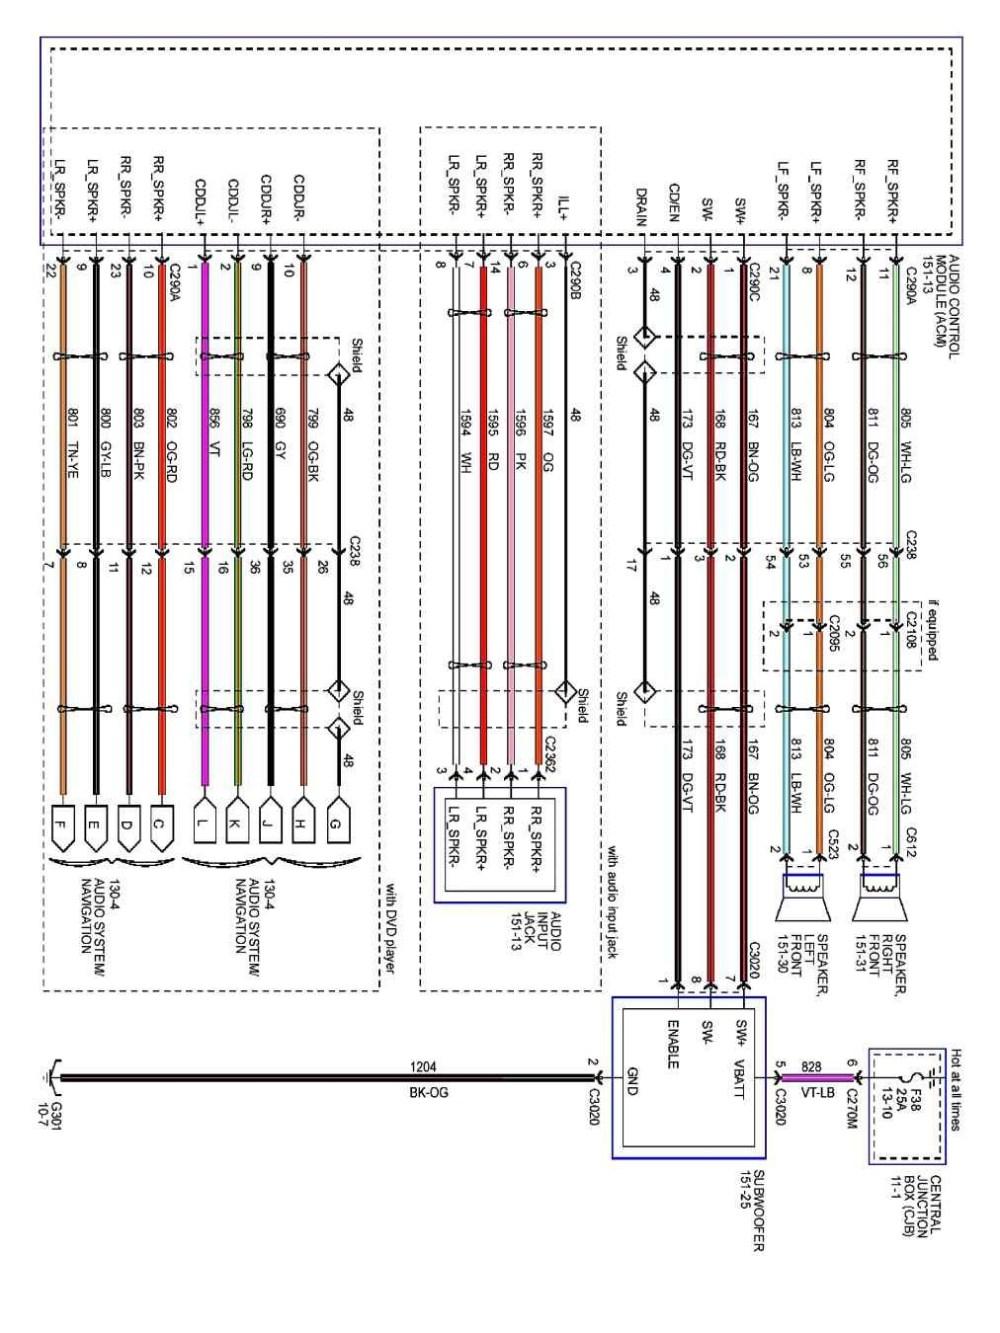 medium resolution of pioneer dxt x2769ui wiring diagram wiring diagram image pioneer dxt x2669ui wiring harness diagram at